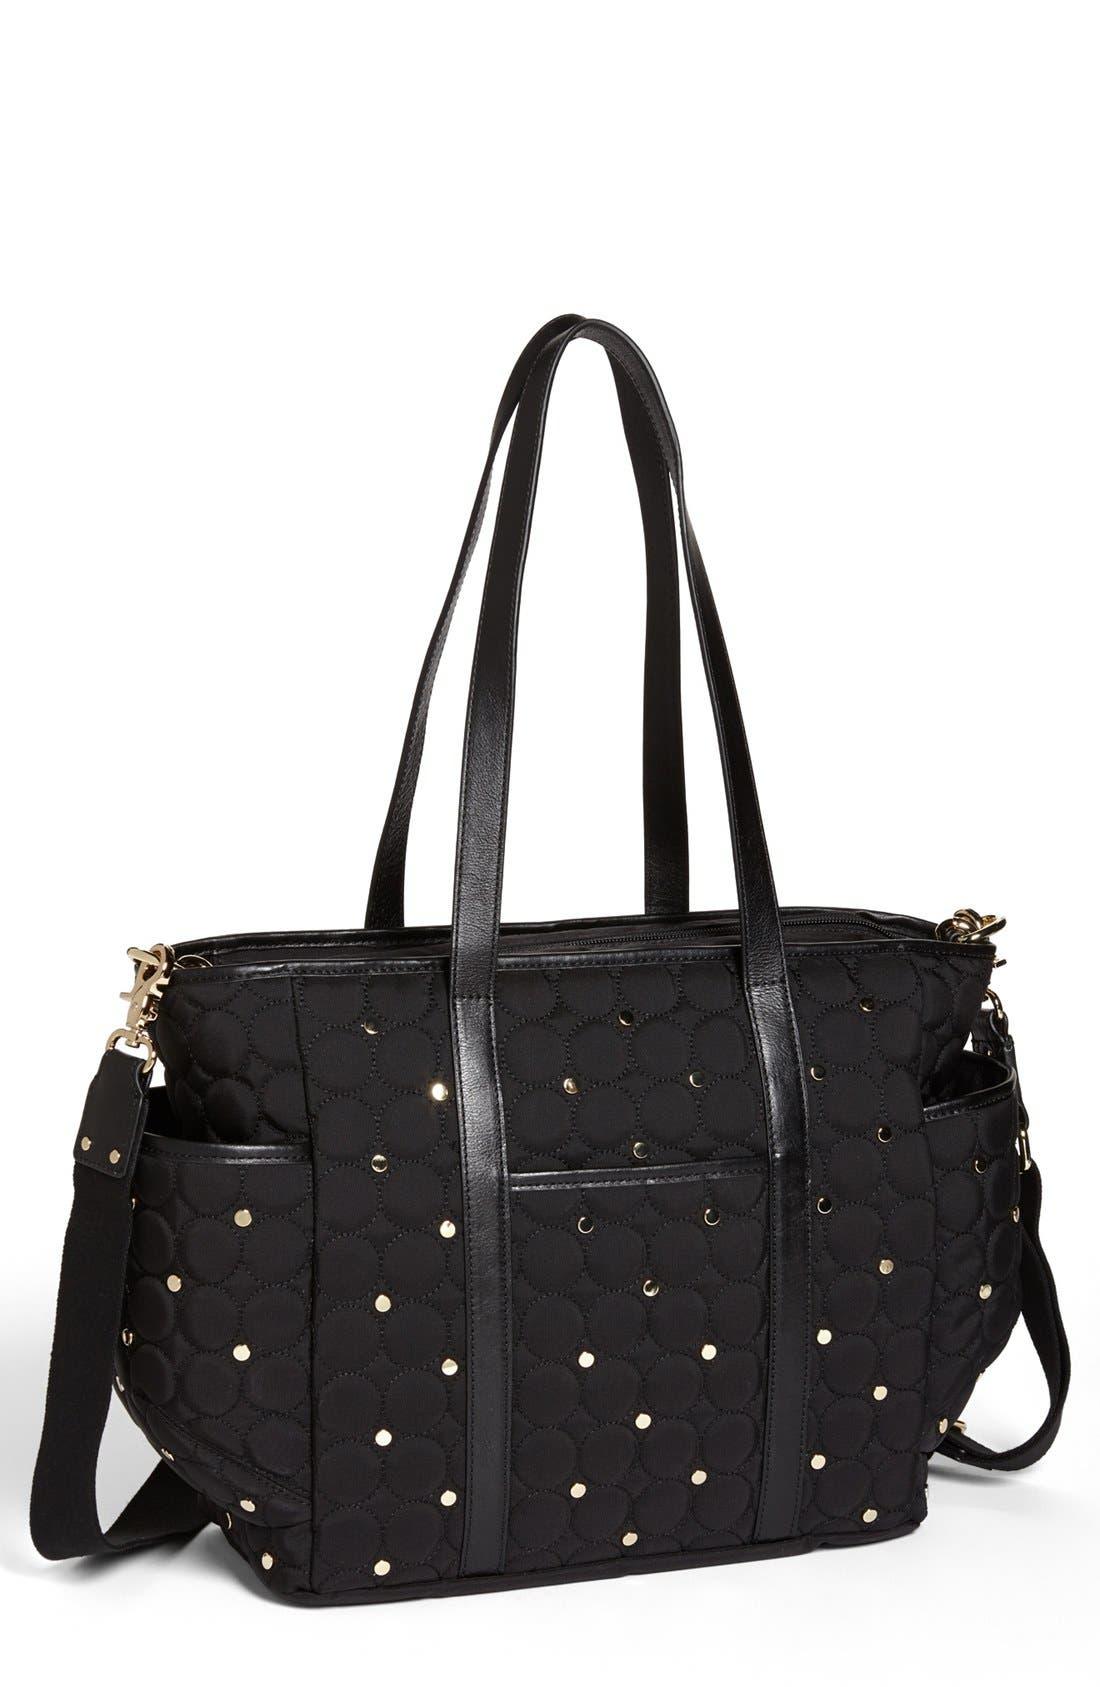 Rebecca Minkoff 'Marissa' Baby Bag